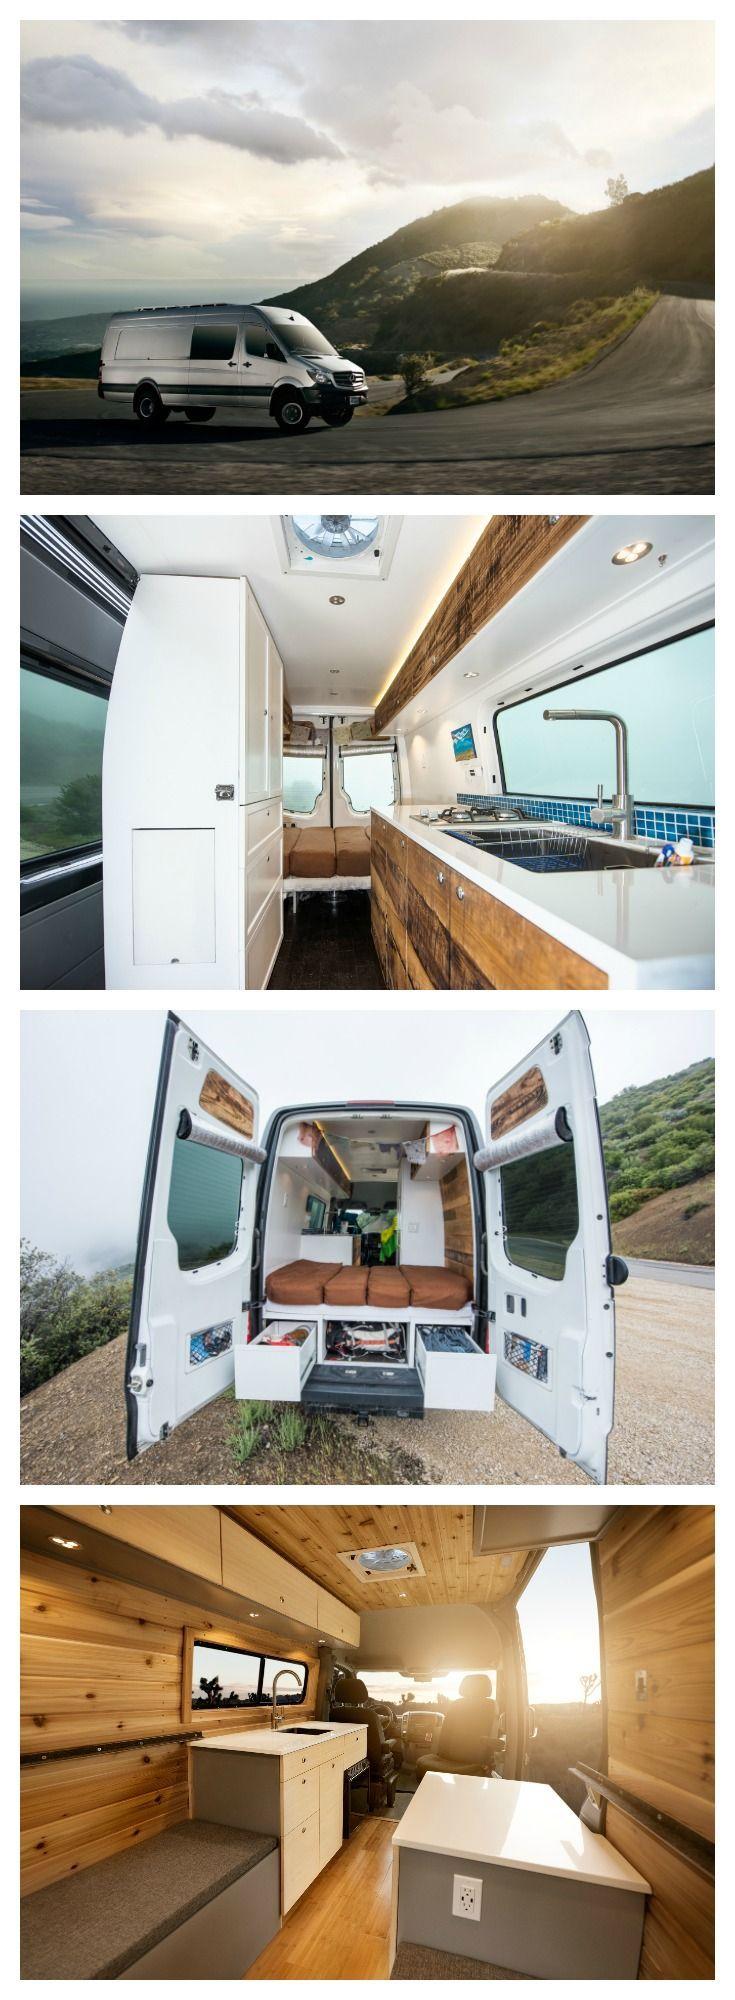 Camper Van Conversion: The best DIY campers and custom builds of 2019